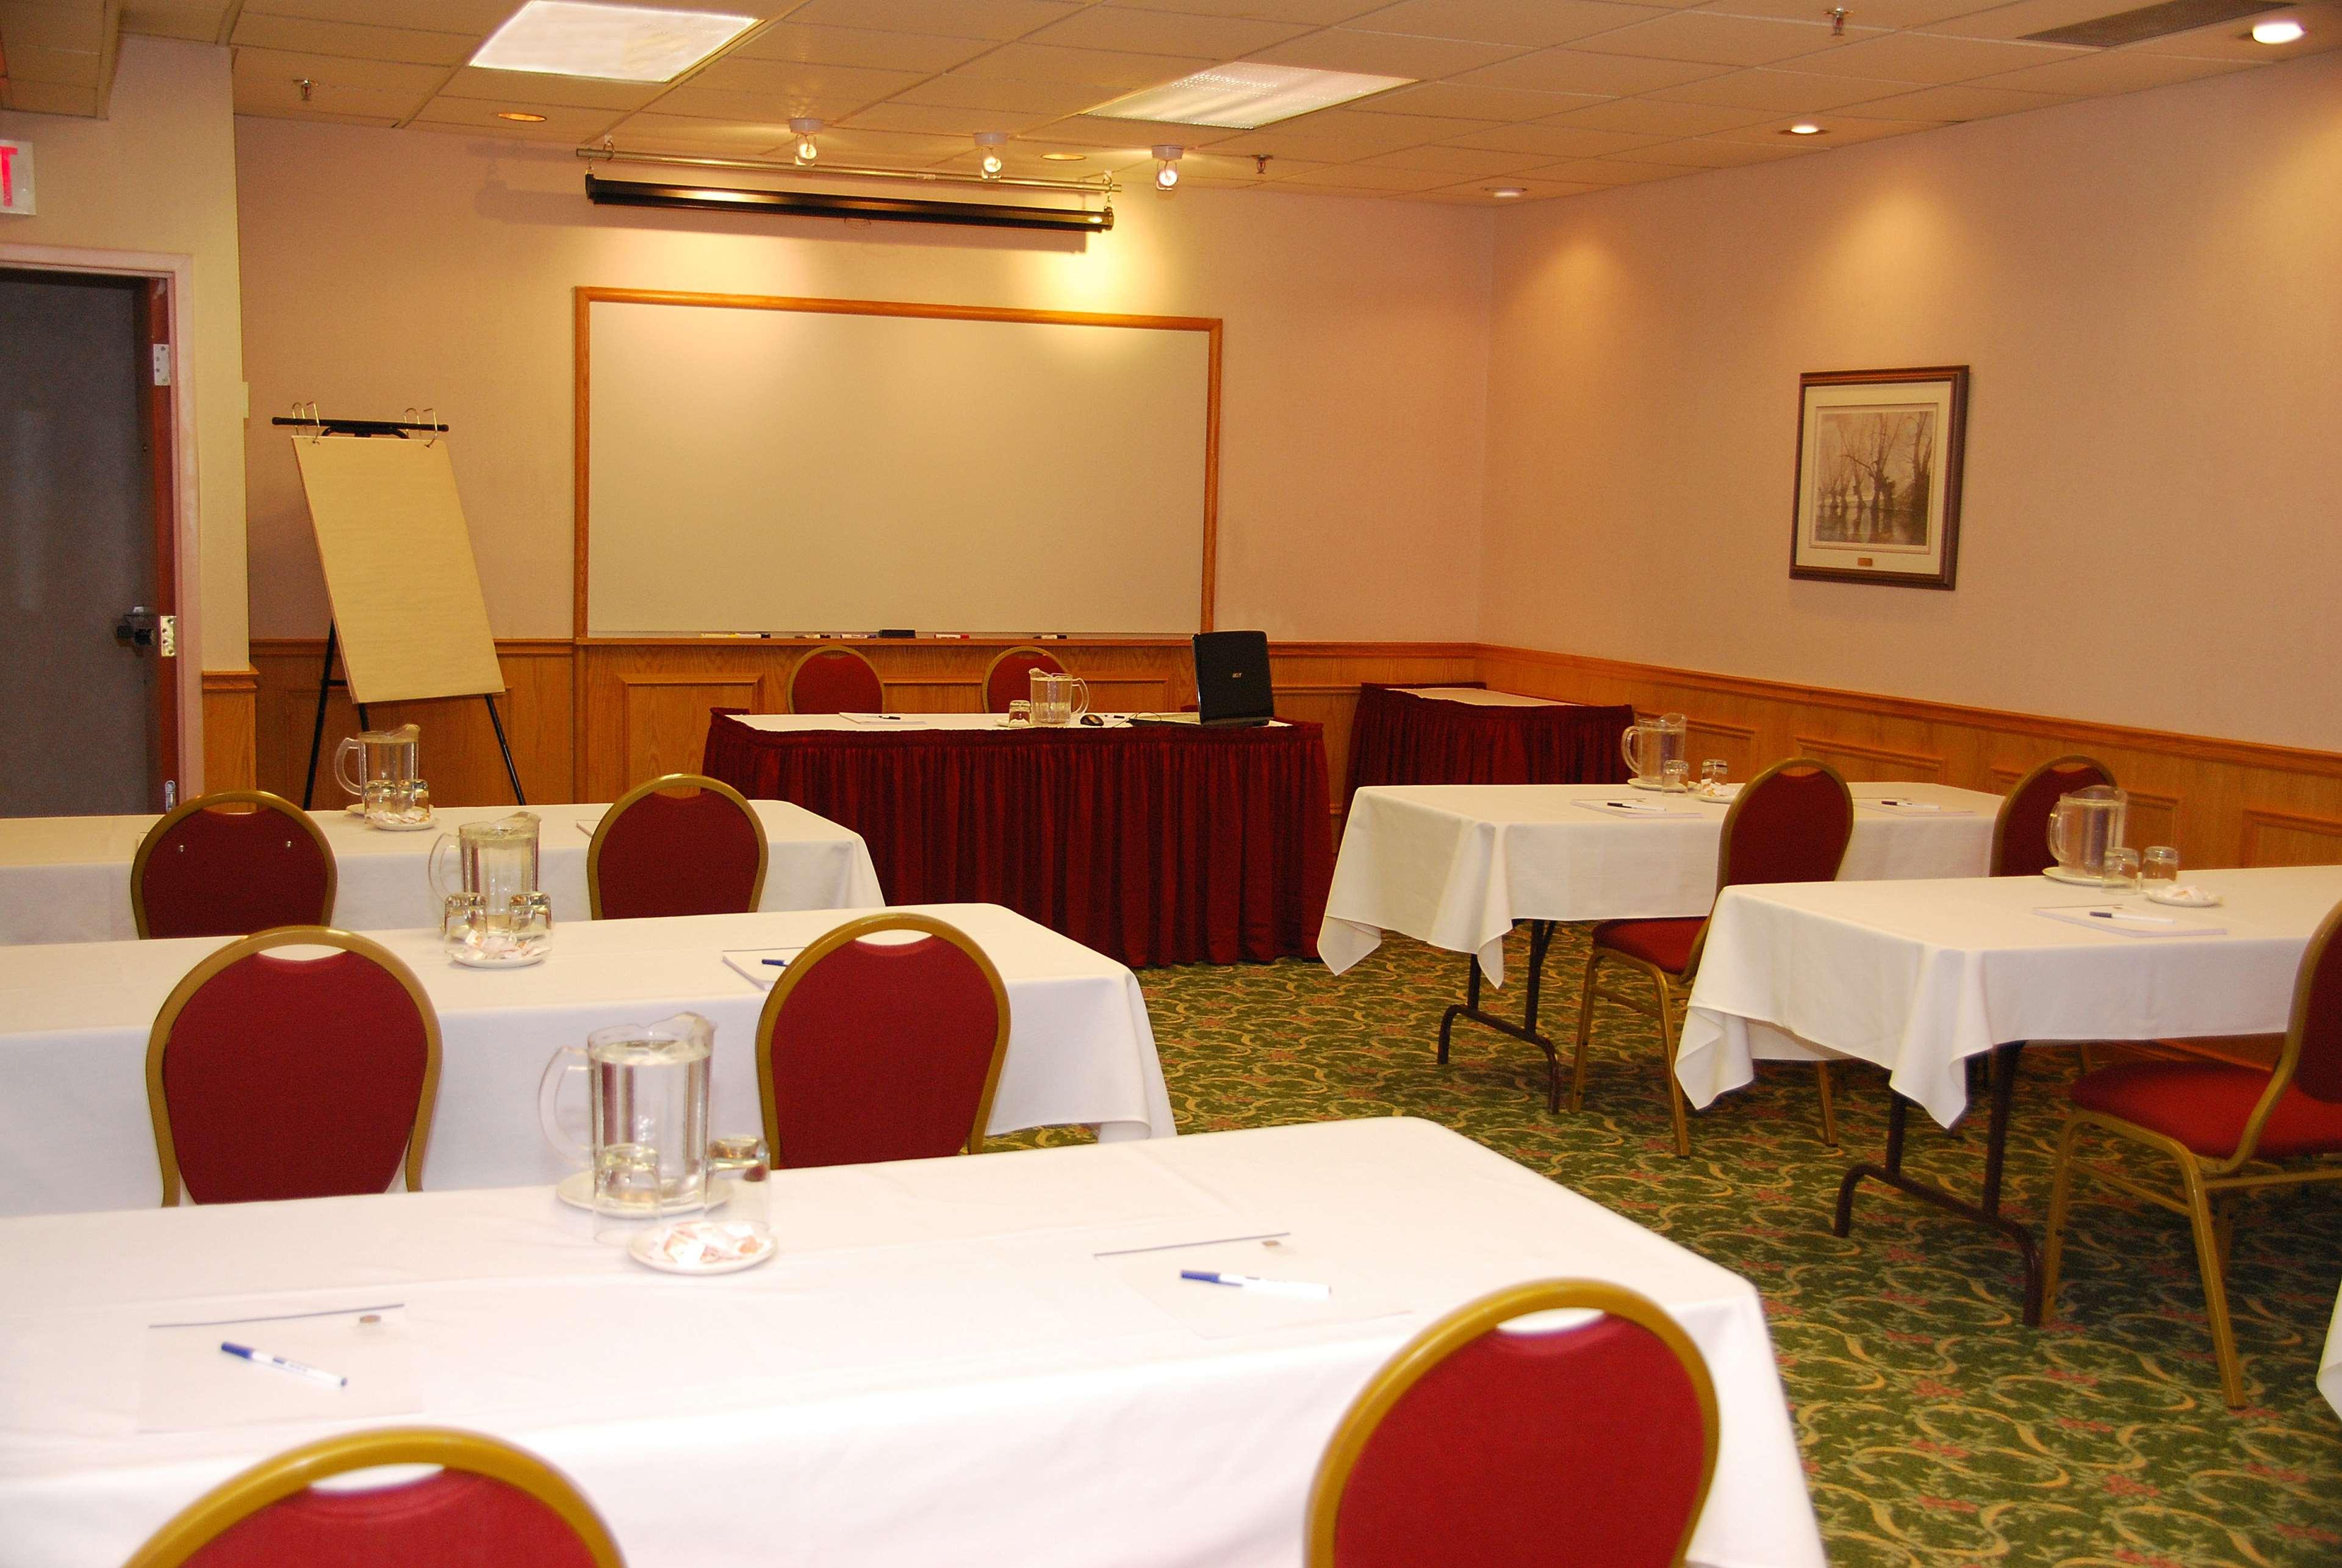 Best Western Voyageur Place Hotel Newmarket